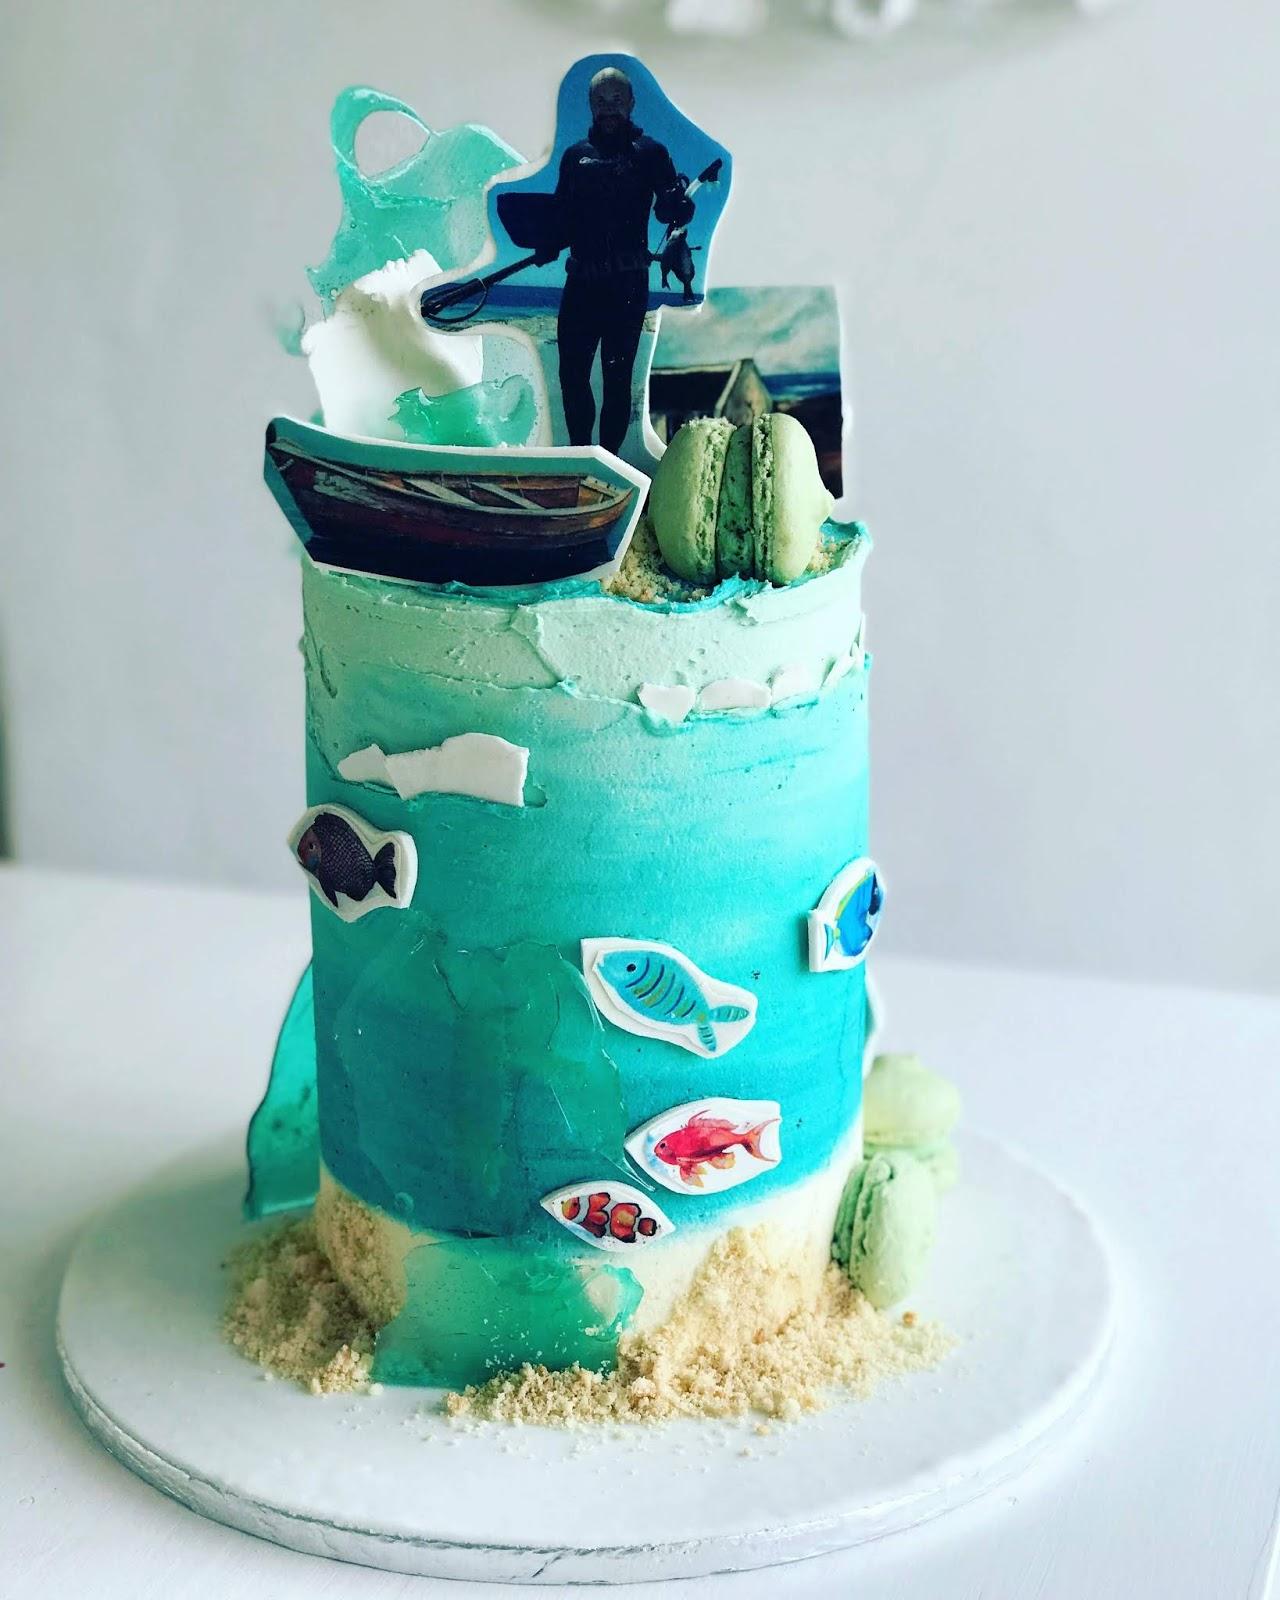 Sphere Fishing Ocean Crazy Cake R720